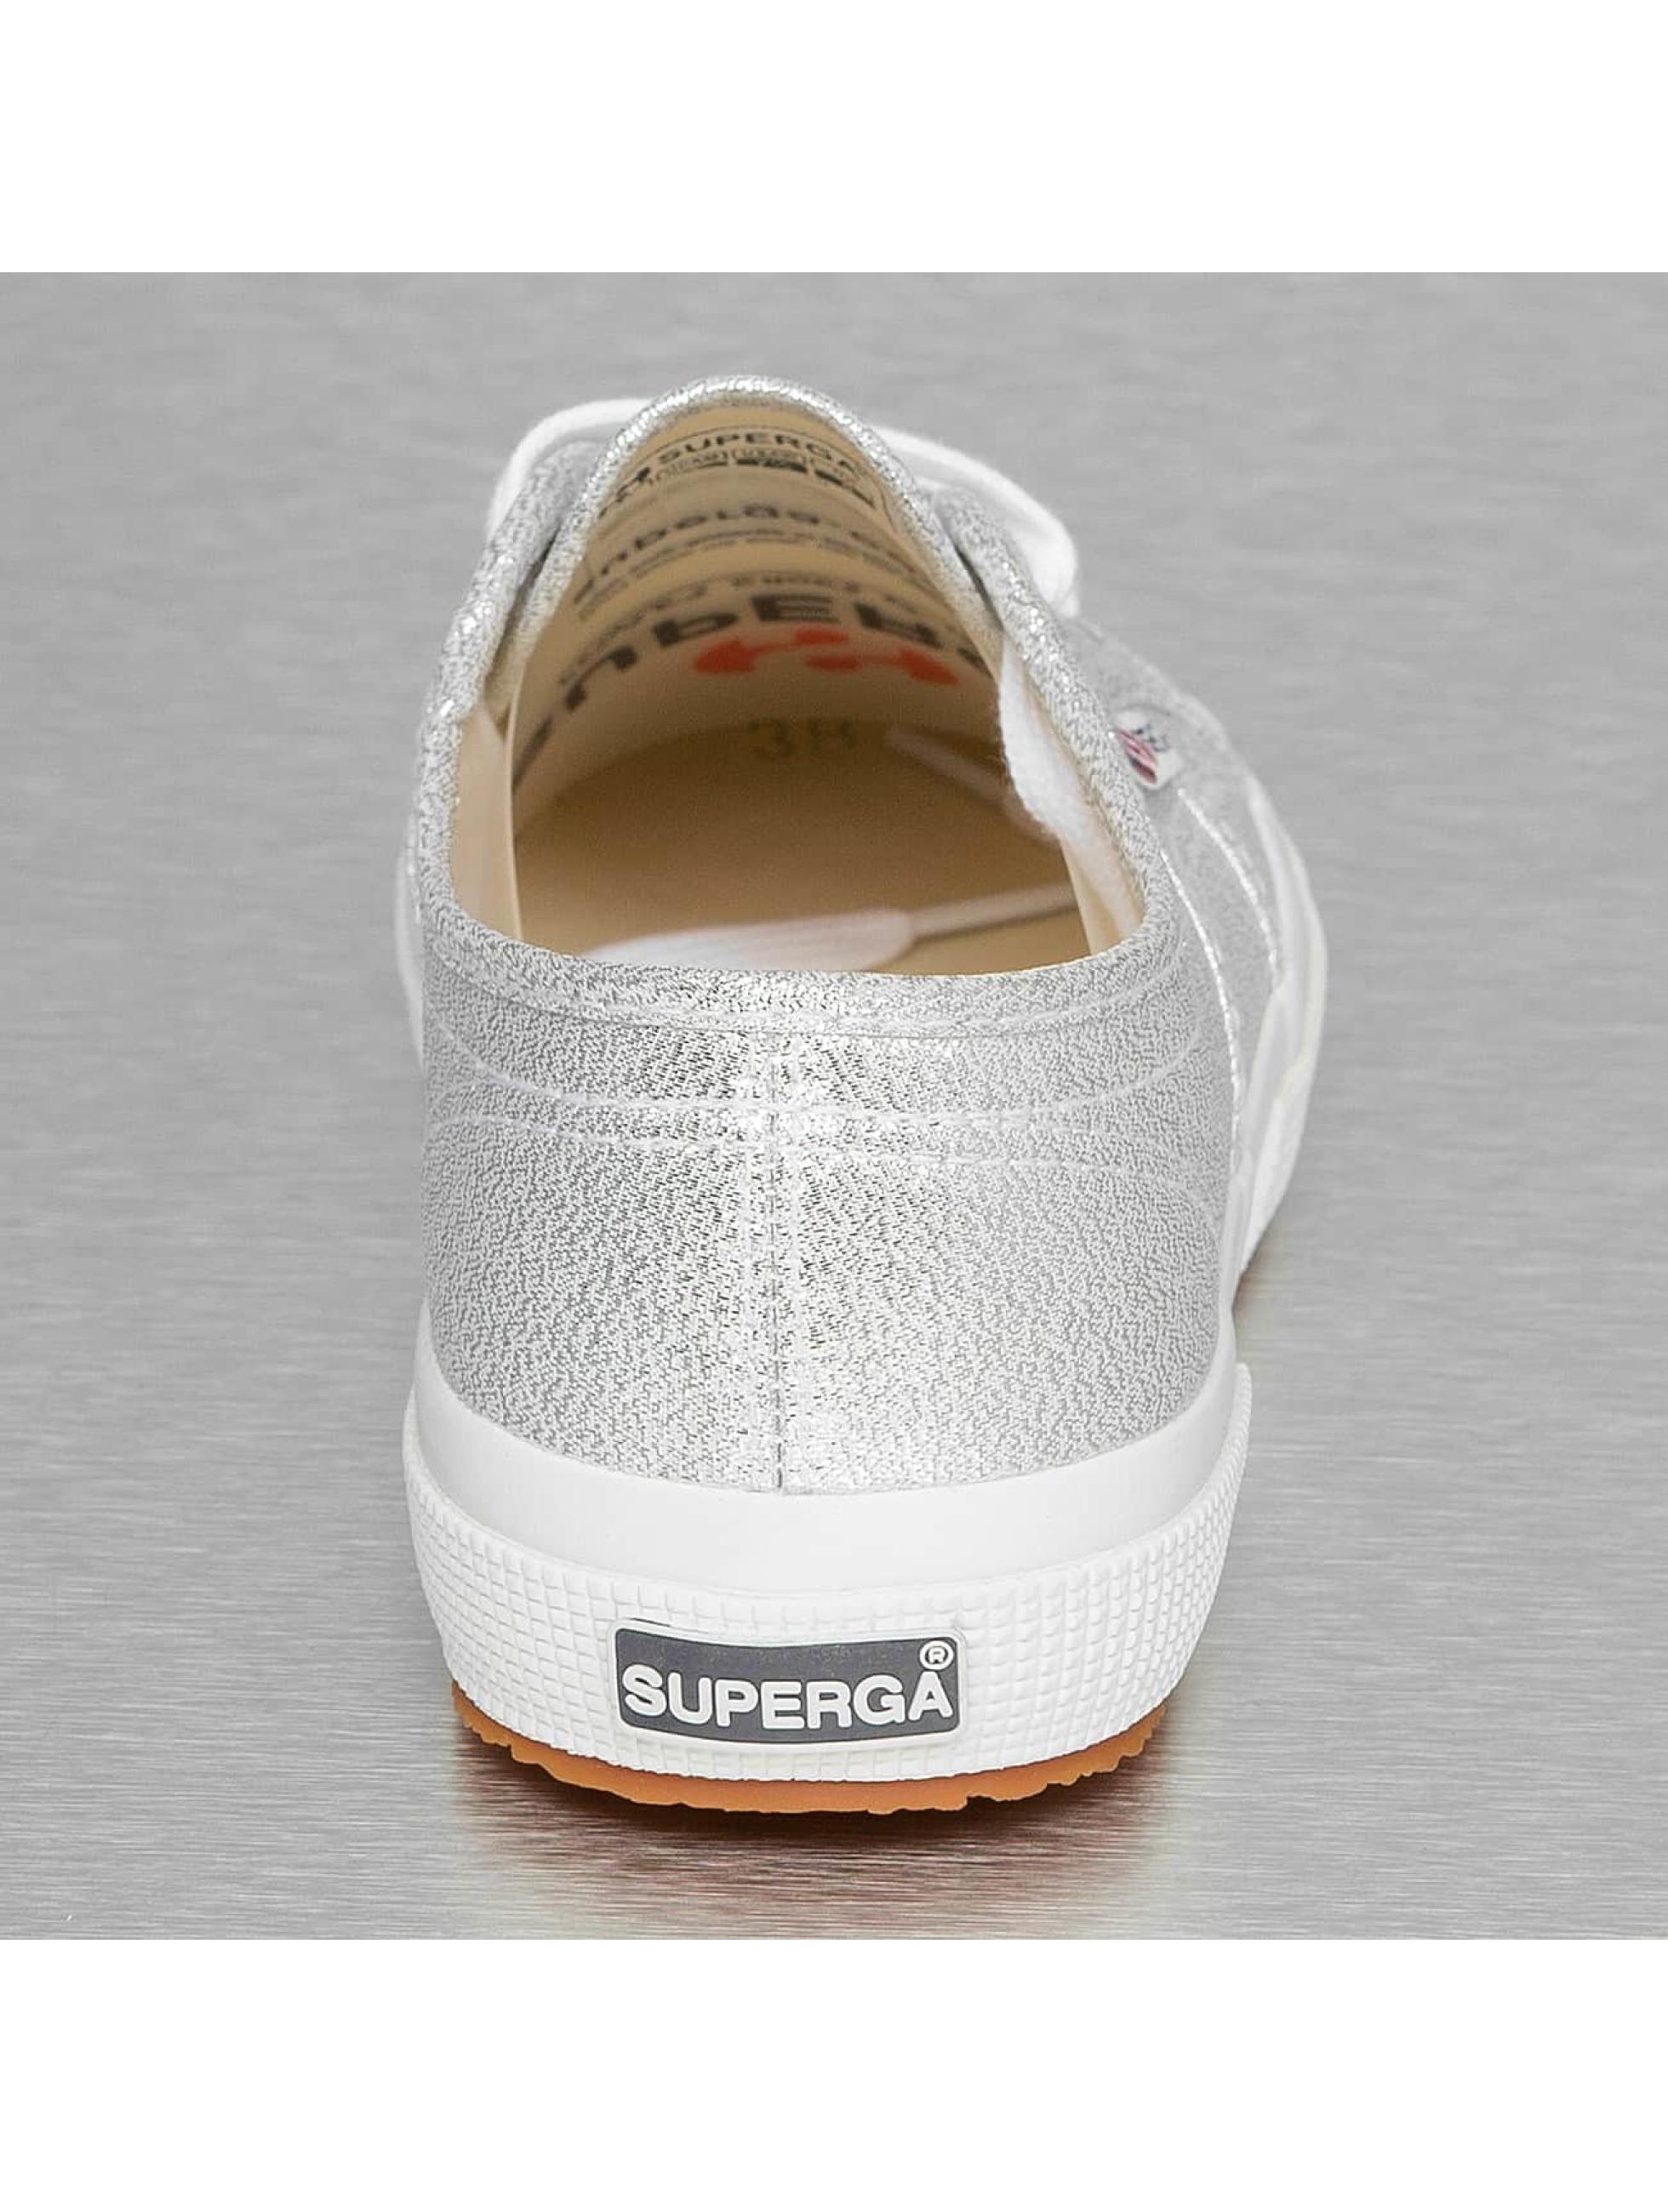 Superga Zapatillas de deporte 2750 Lamew plata